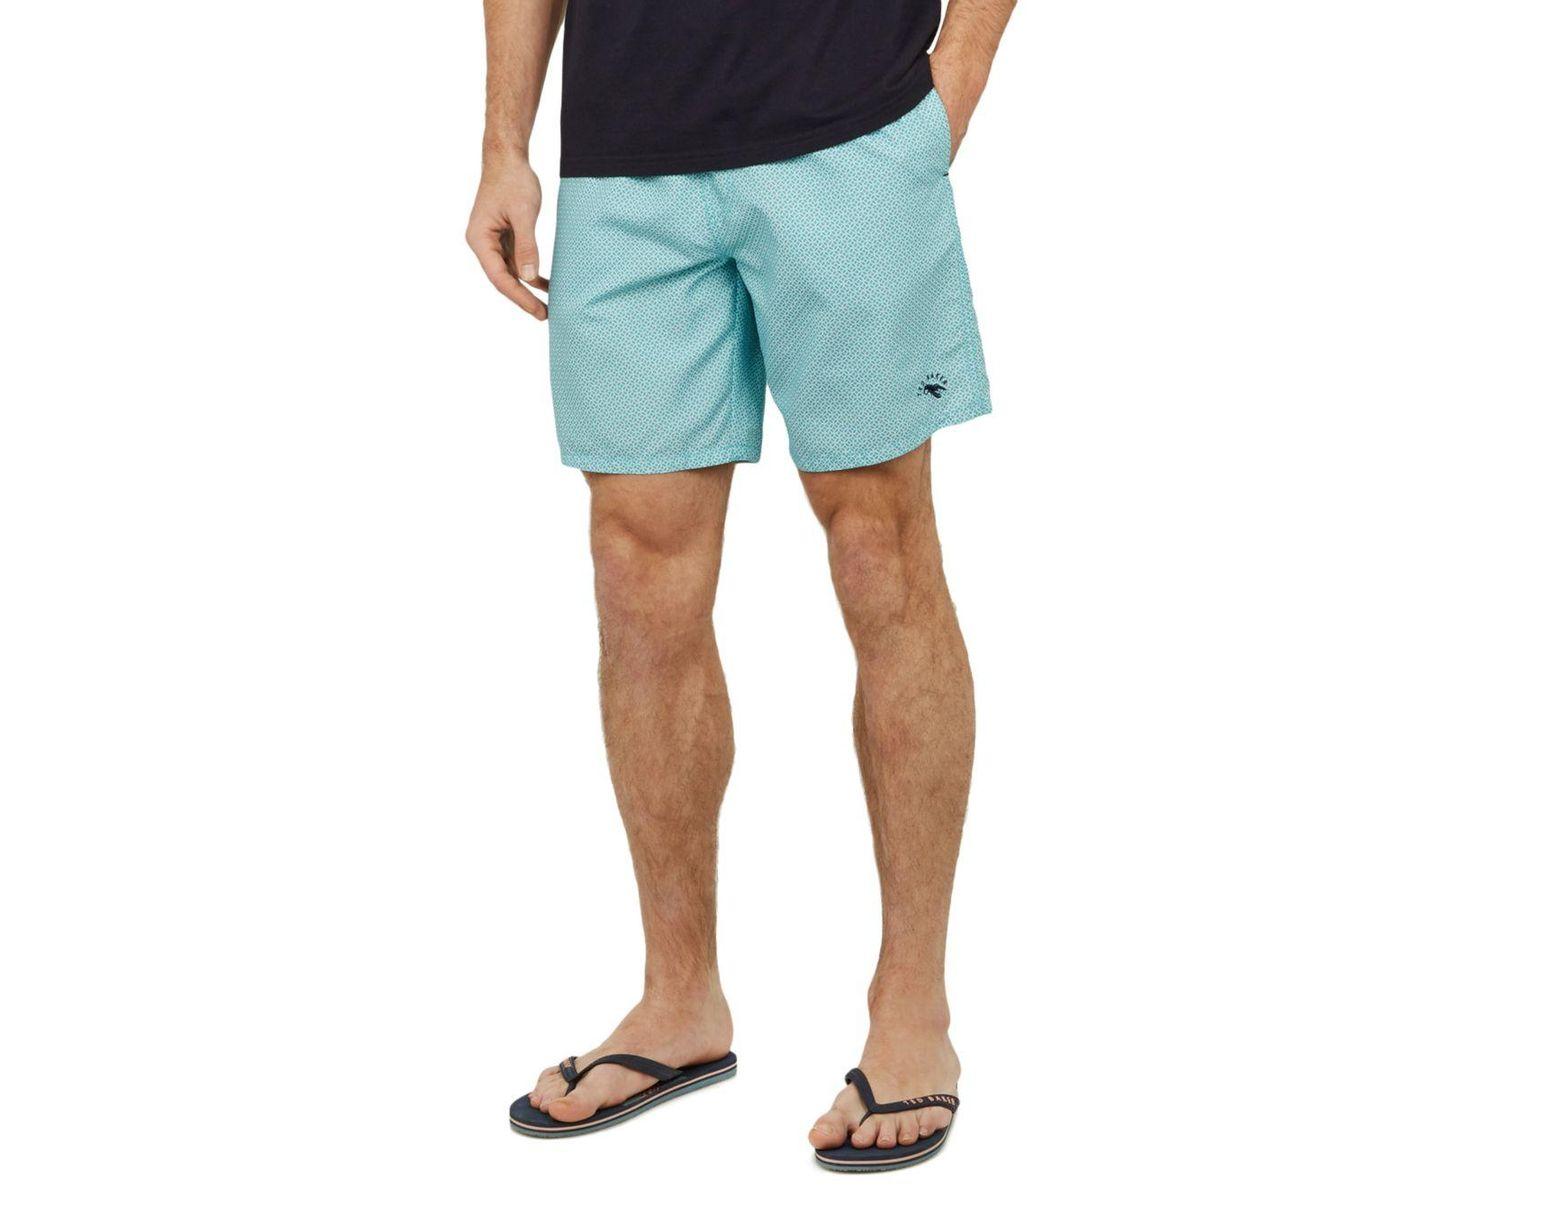 bdb112c217 Ted Baker Geo Print Midi Swim Shorts in Blue for Men - Lyst